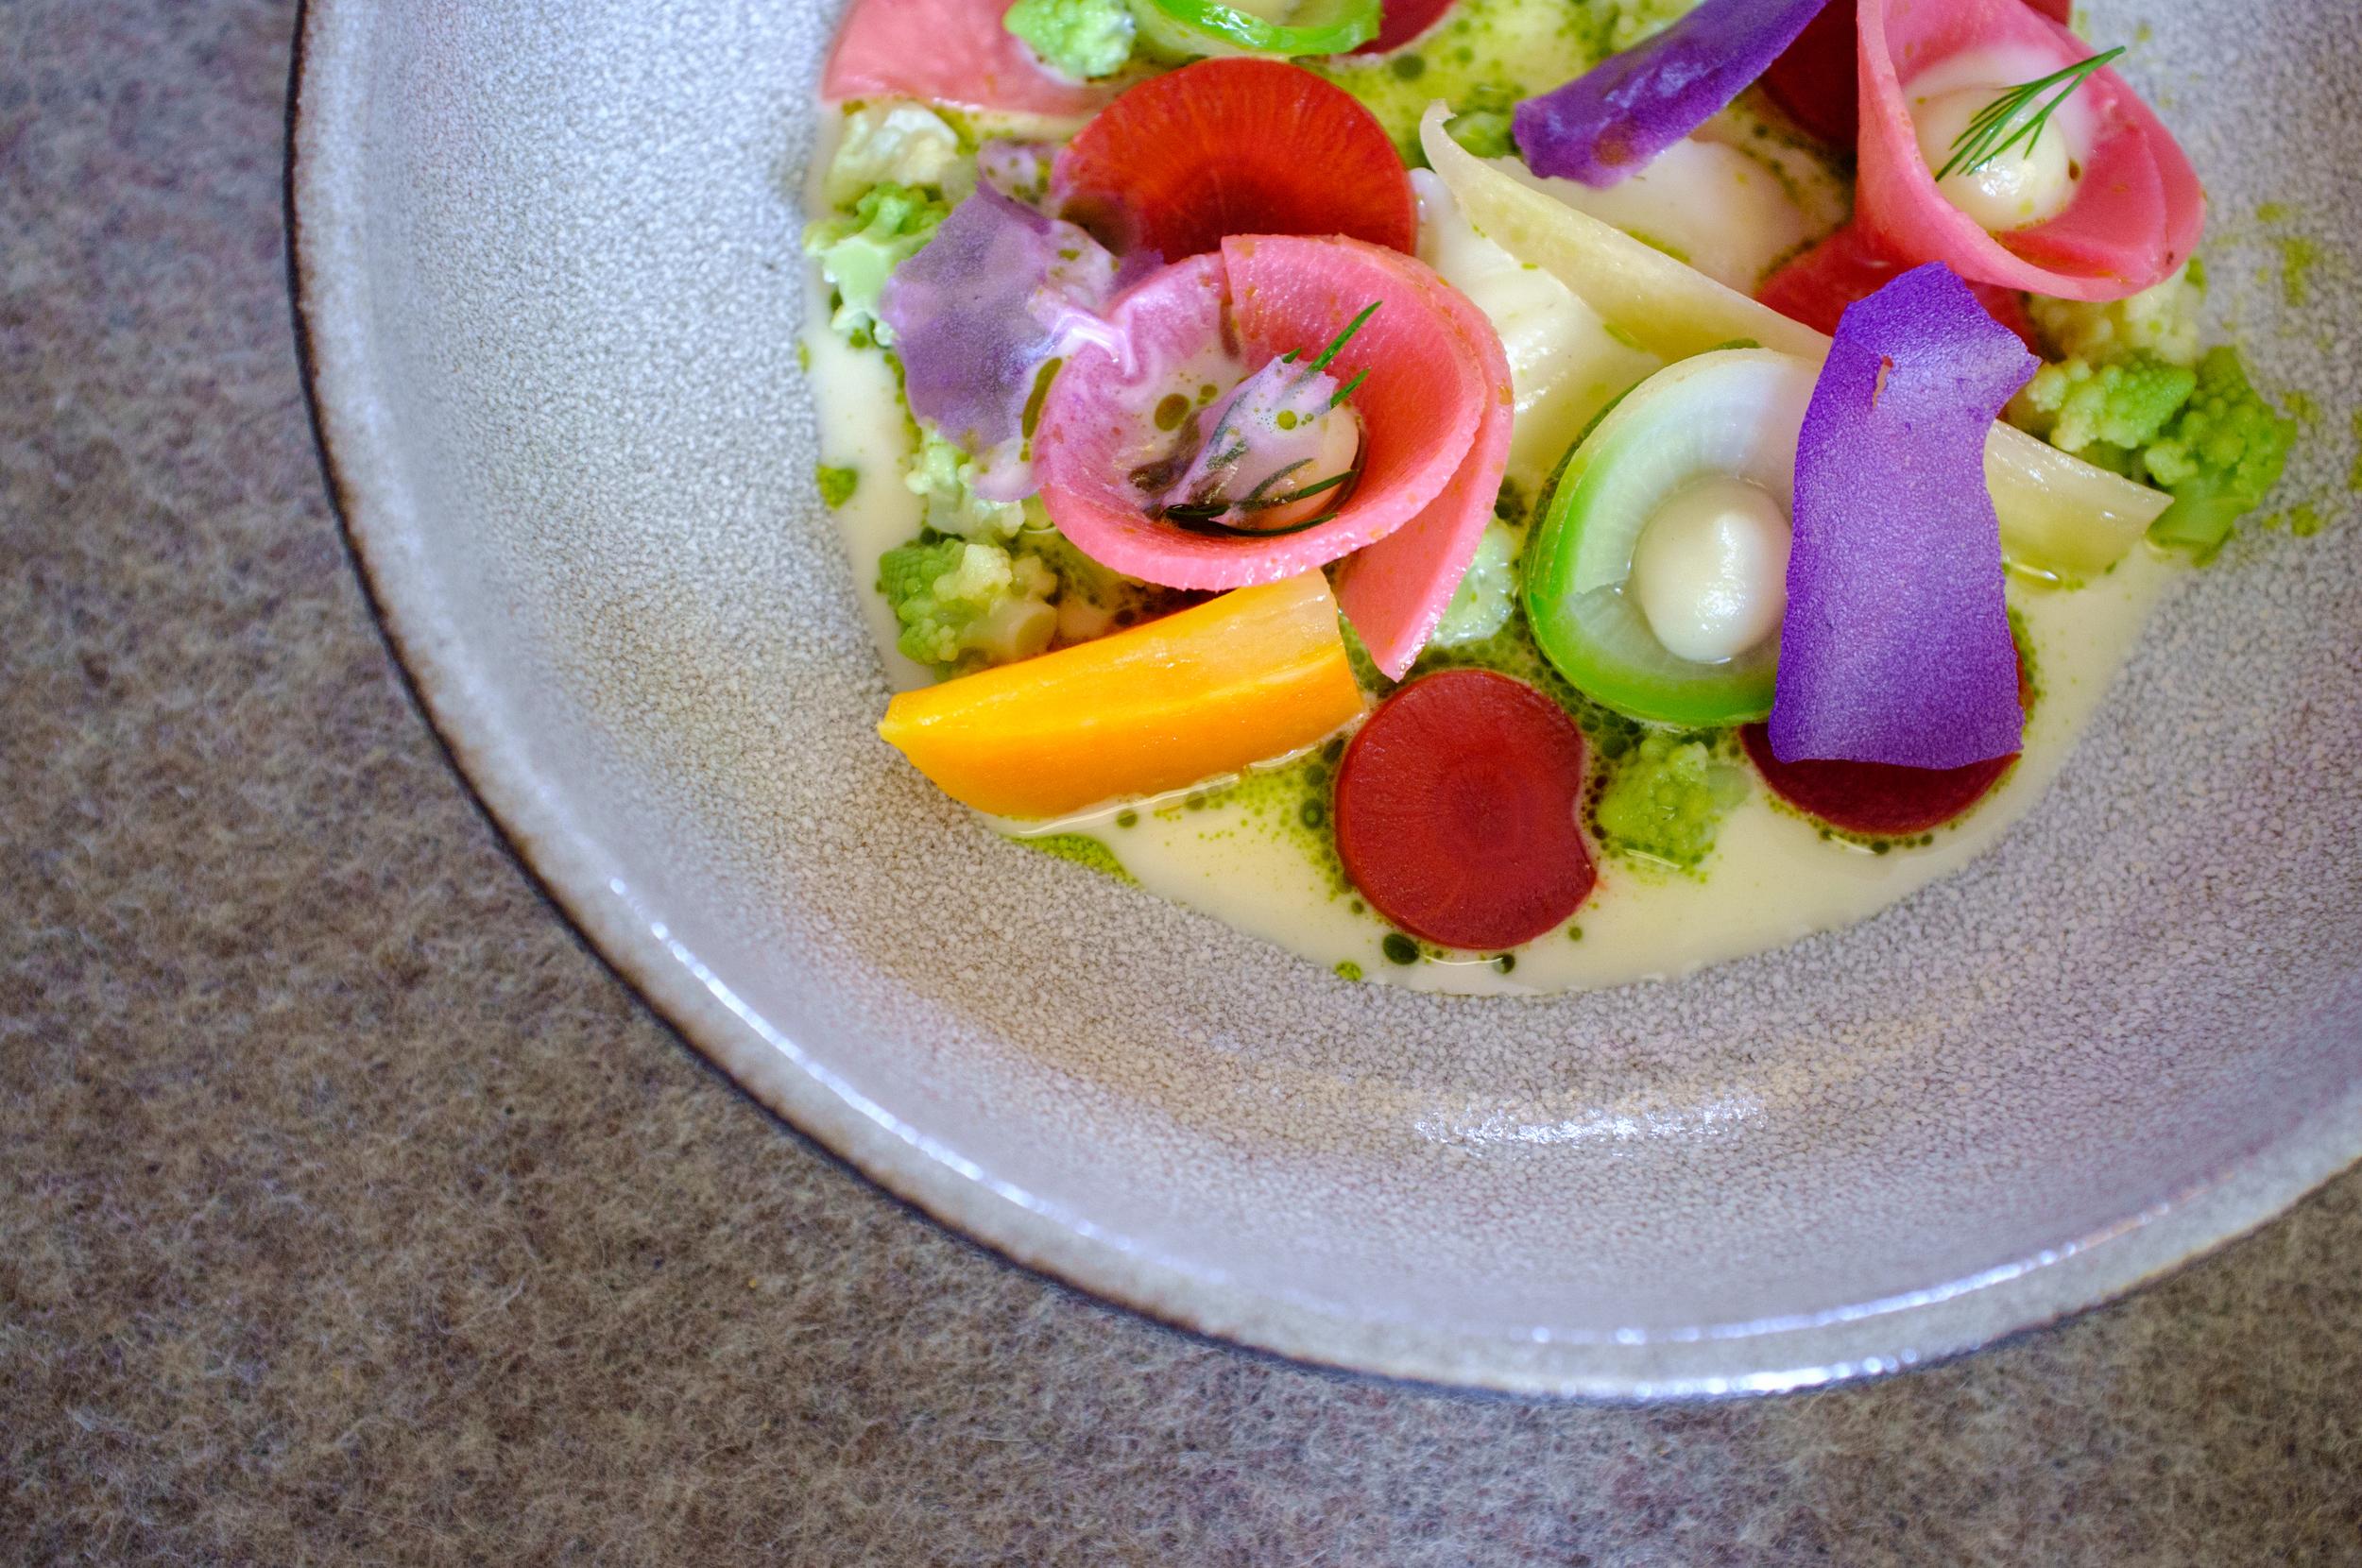 Lacto-fermented vegetables, milk jus